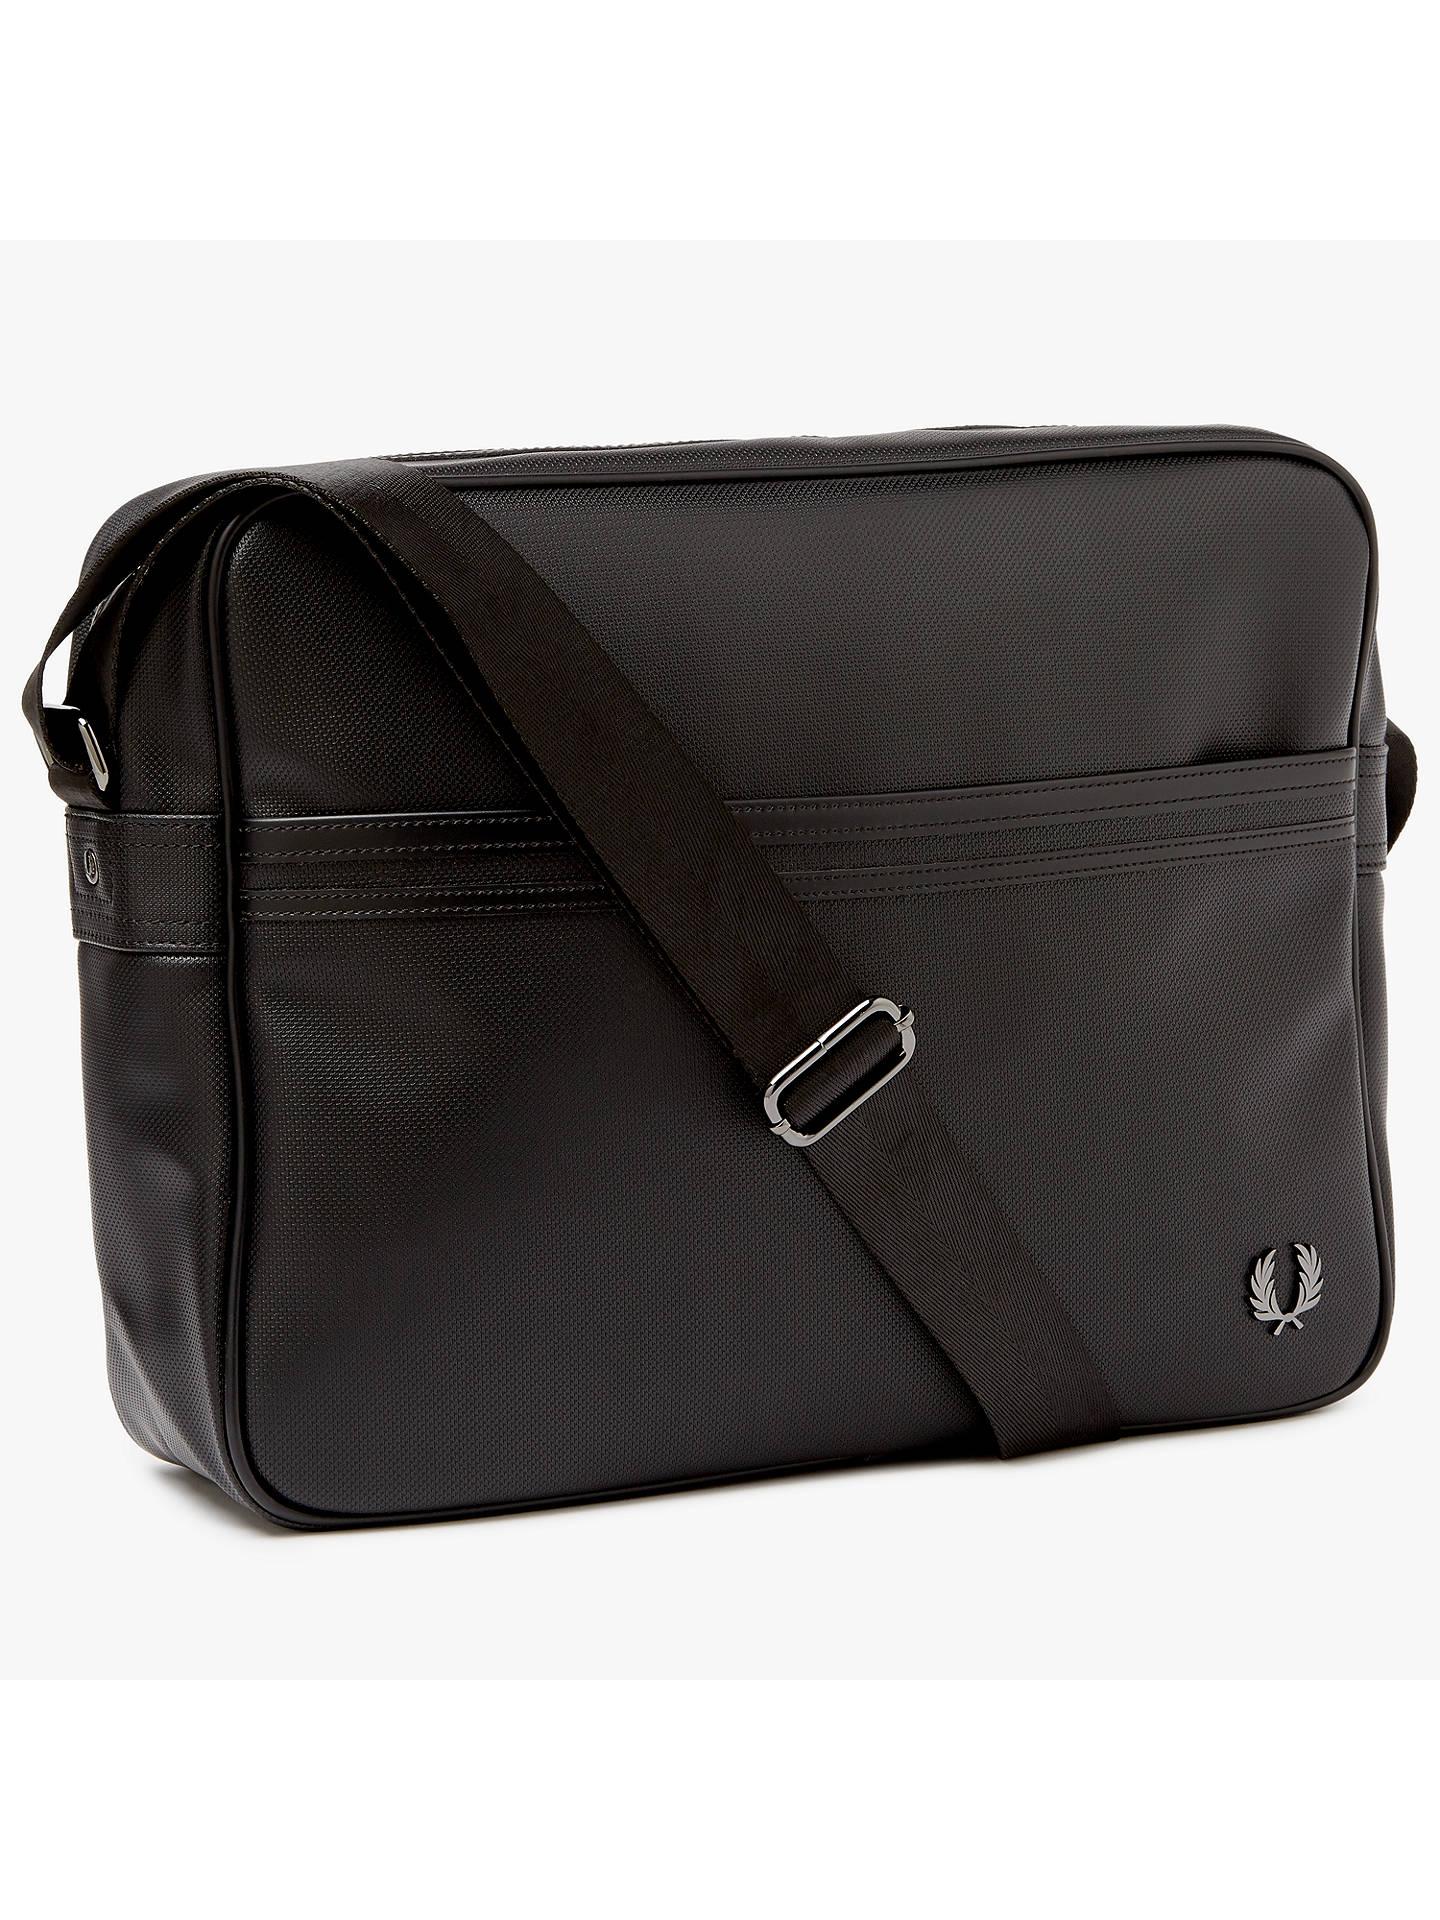 senast storlek 40 nya stilar Fred Perry Piqué Texture Shoulder Bag, Black at John Lewis & Partners